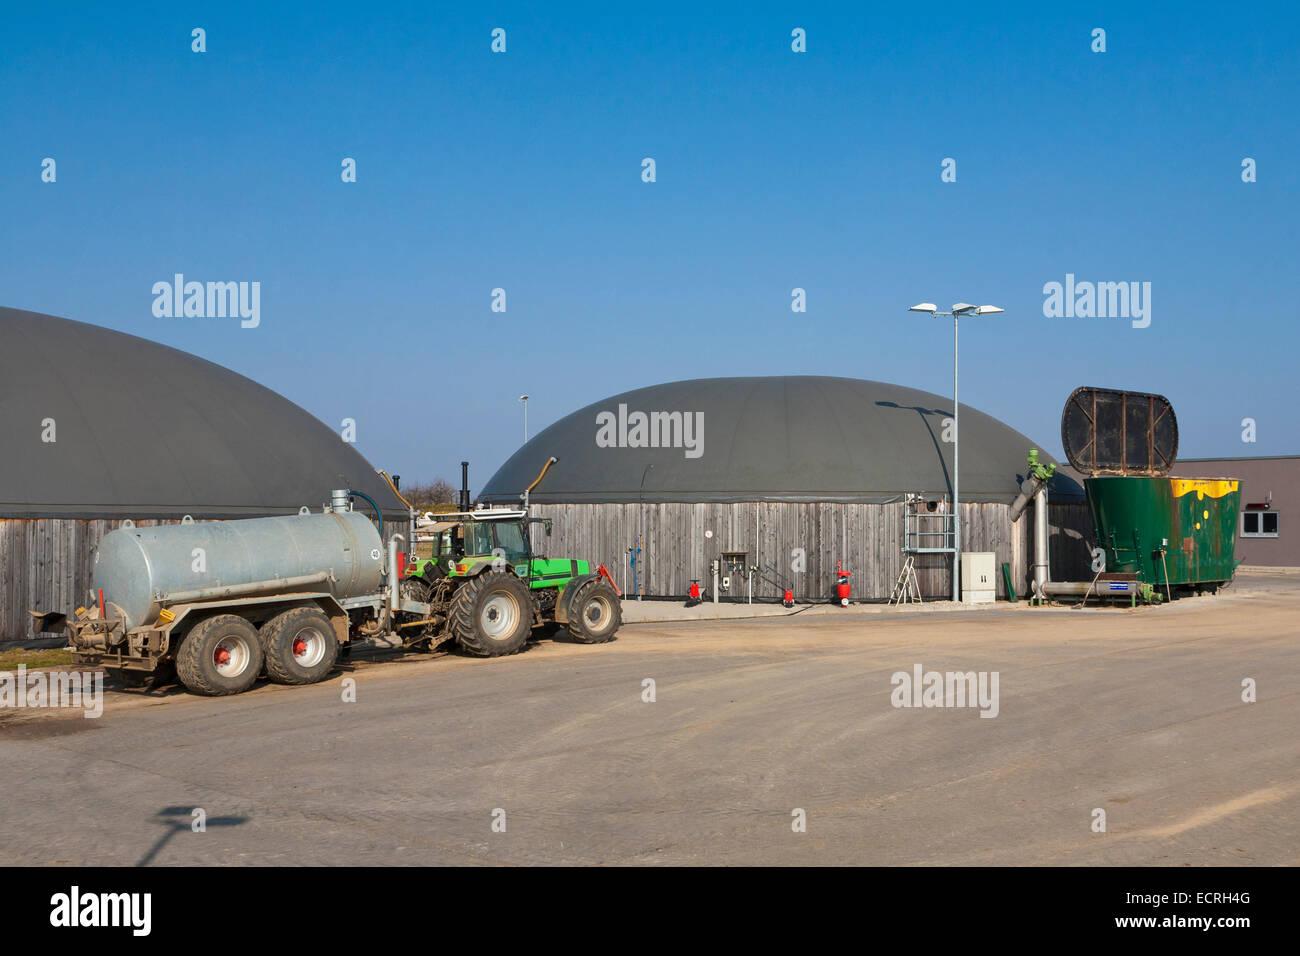 DIGESTER, BIOGAS PLANT, FERMENTATION PLANT, FERMENTATION OF BIOMASS, ENERGY EXTRAKTION, FELLBACH, BADEN-WURTTEMBERG, - Stock Image